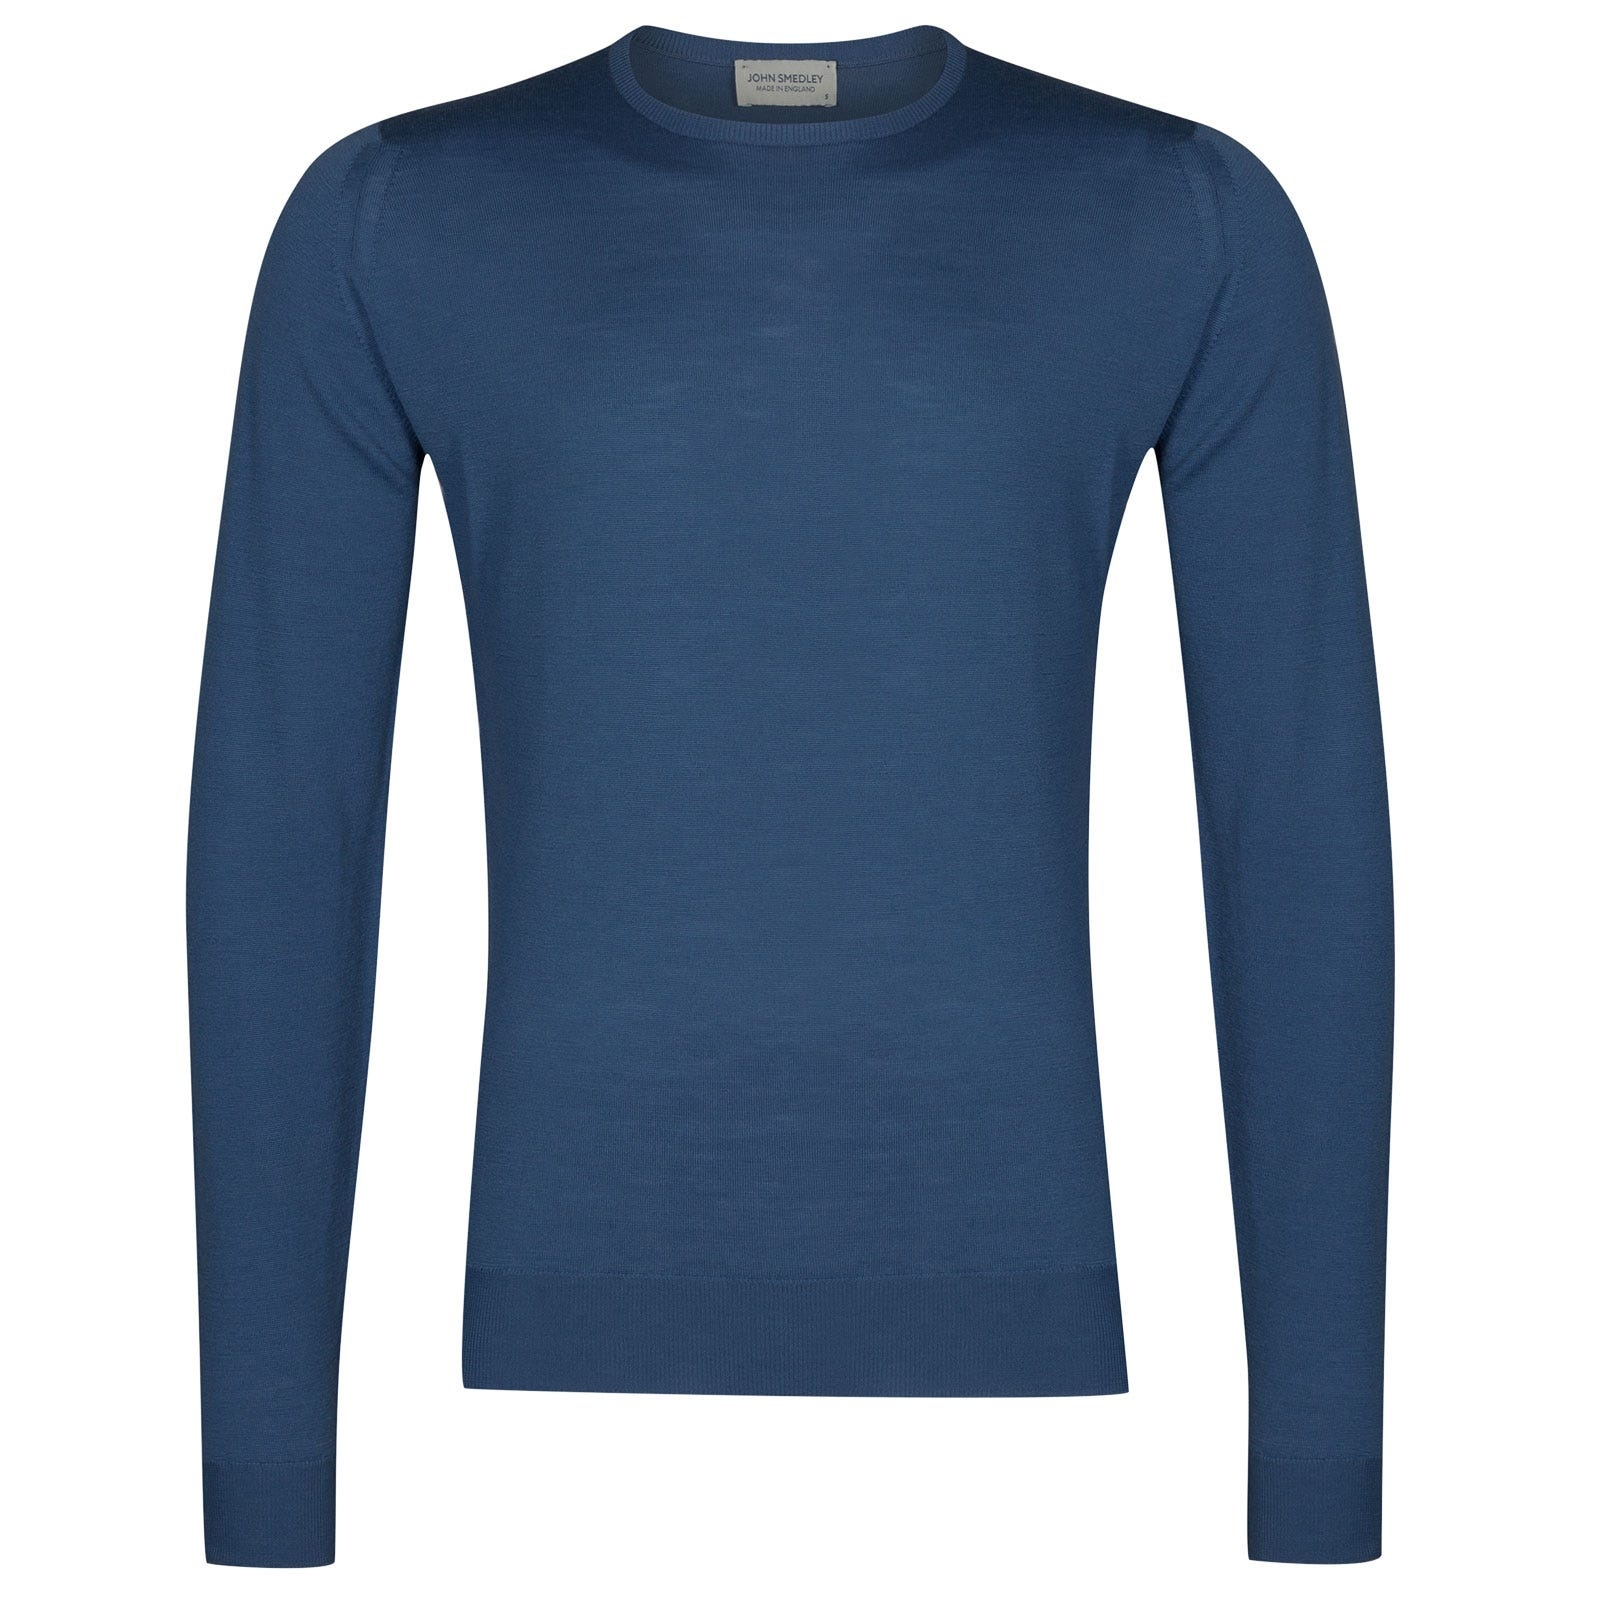 John Smedley lundy Merino Wool Pullover in Derwent Blue-XL